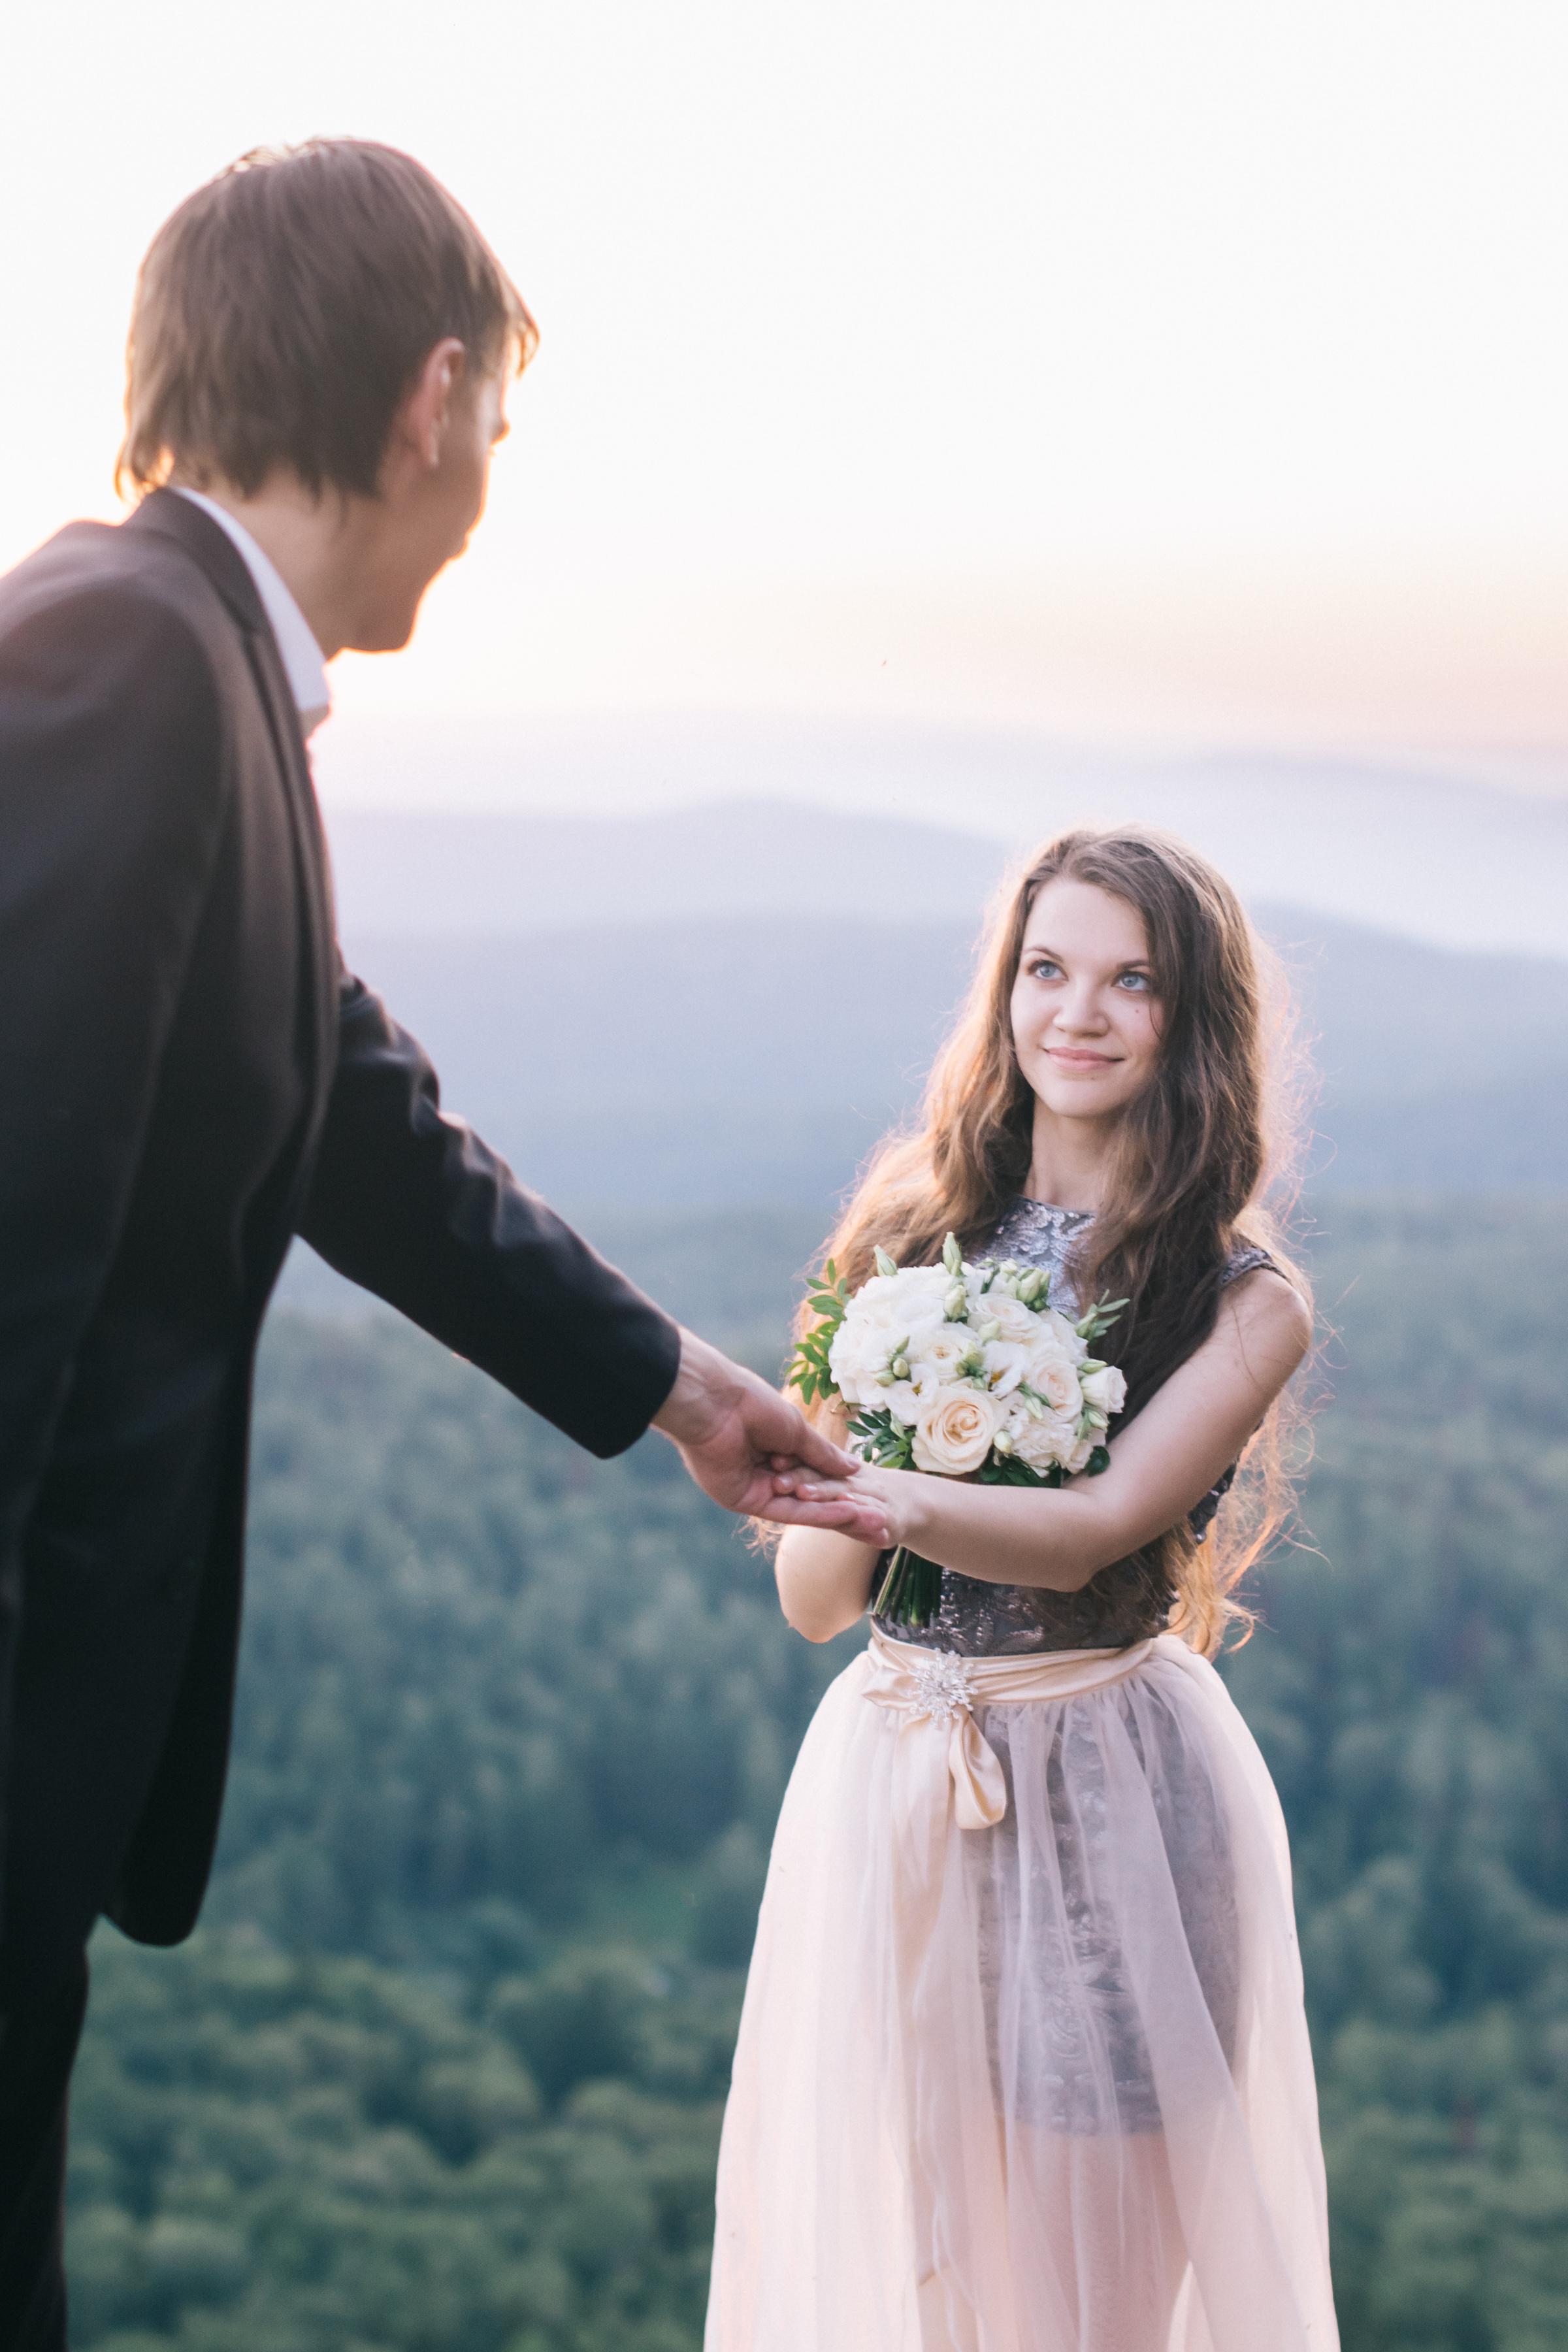 Свадебная съёмка Красноярские столбы